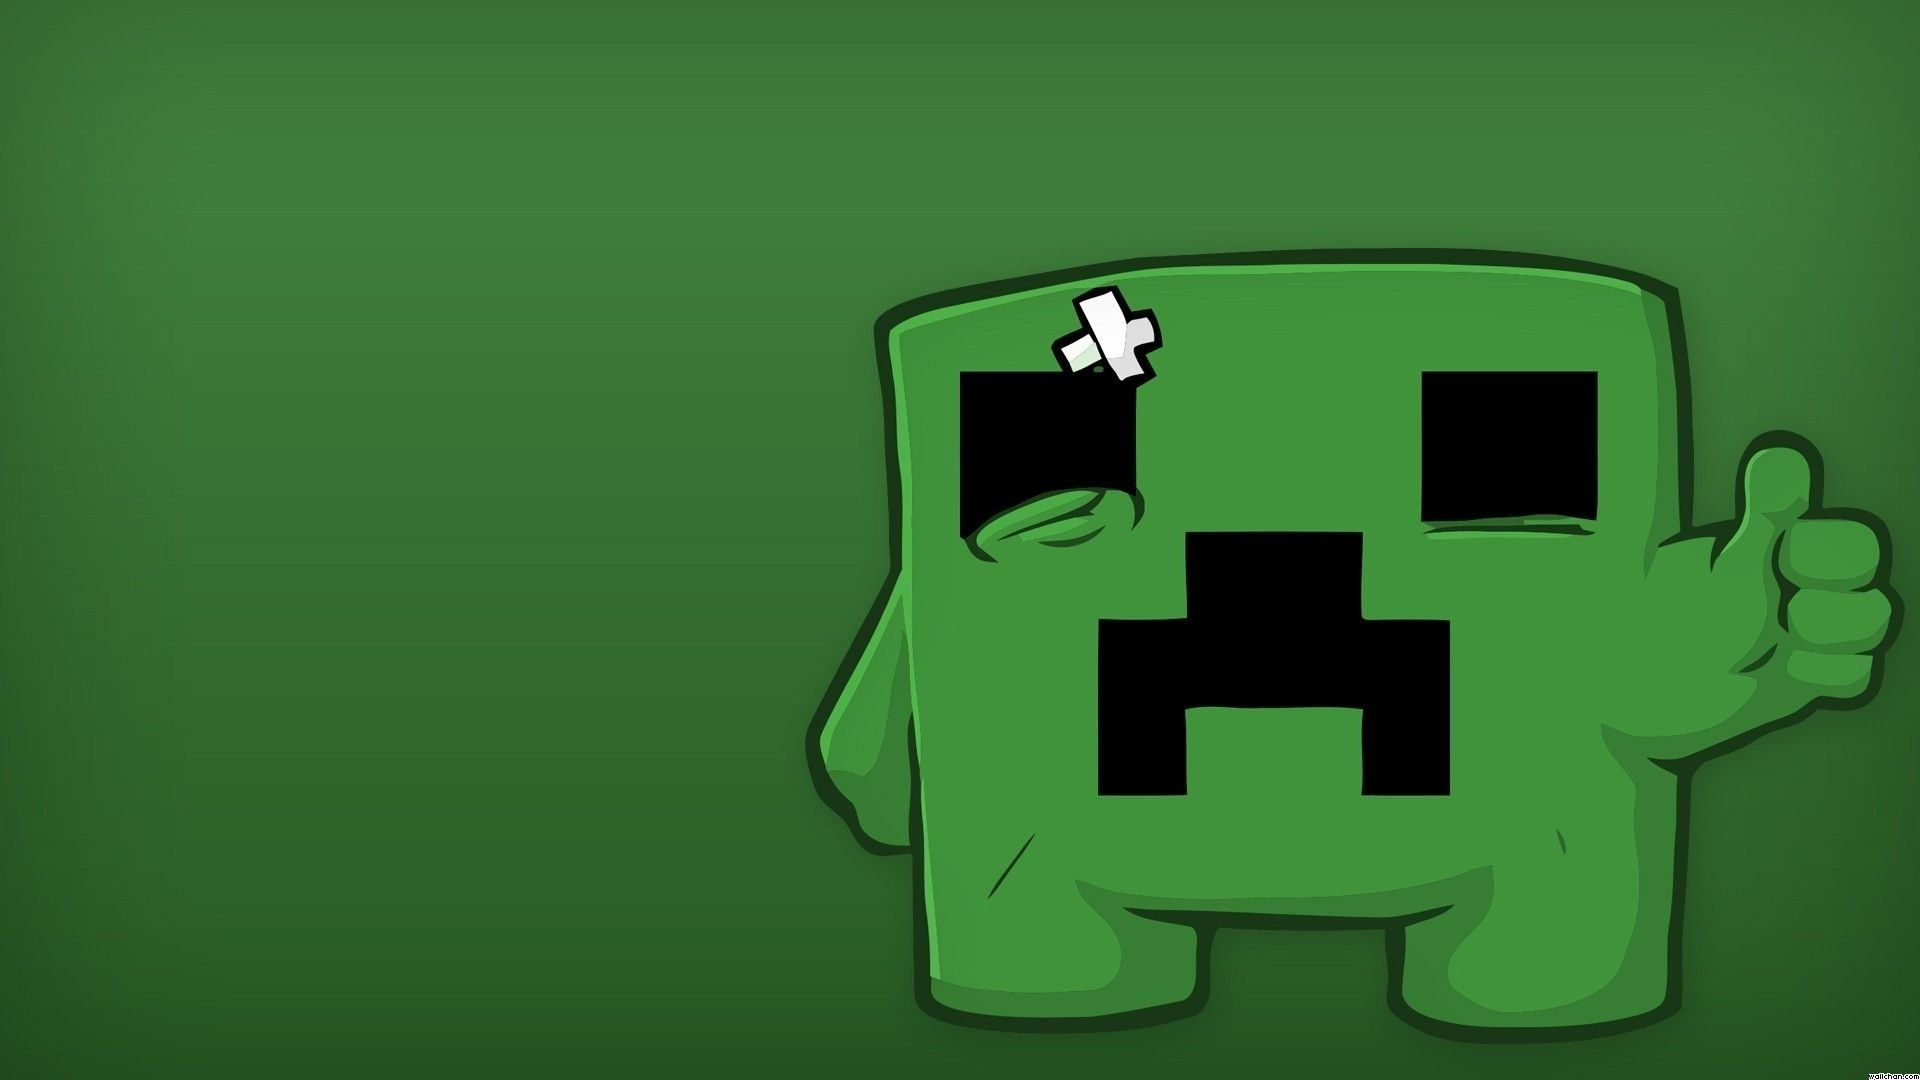 Top Wallpaper Minecraft Youtube - ca66d3cdcf57a1dbda32739339158e78  Collection_142187.jpg